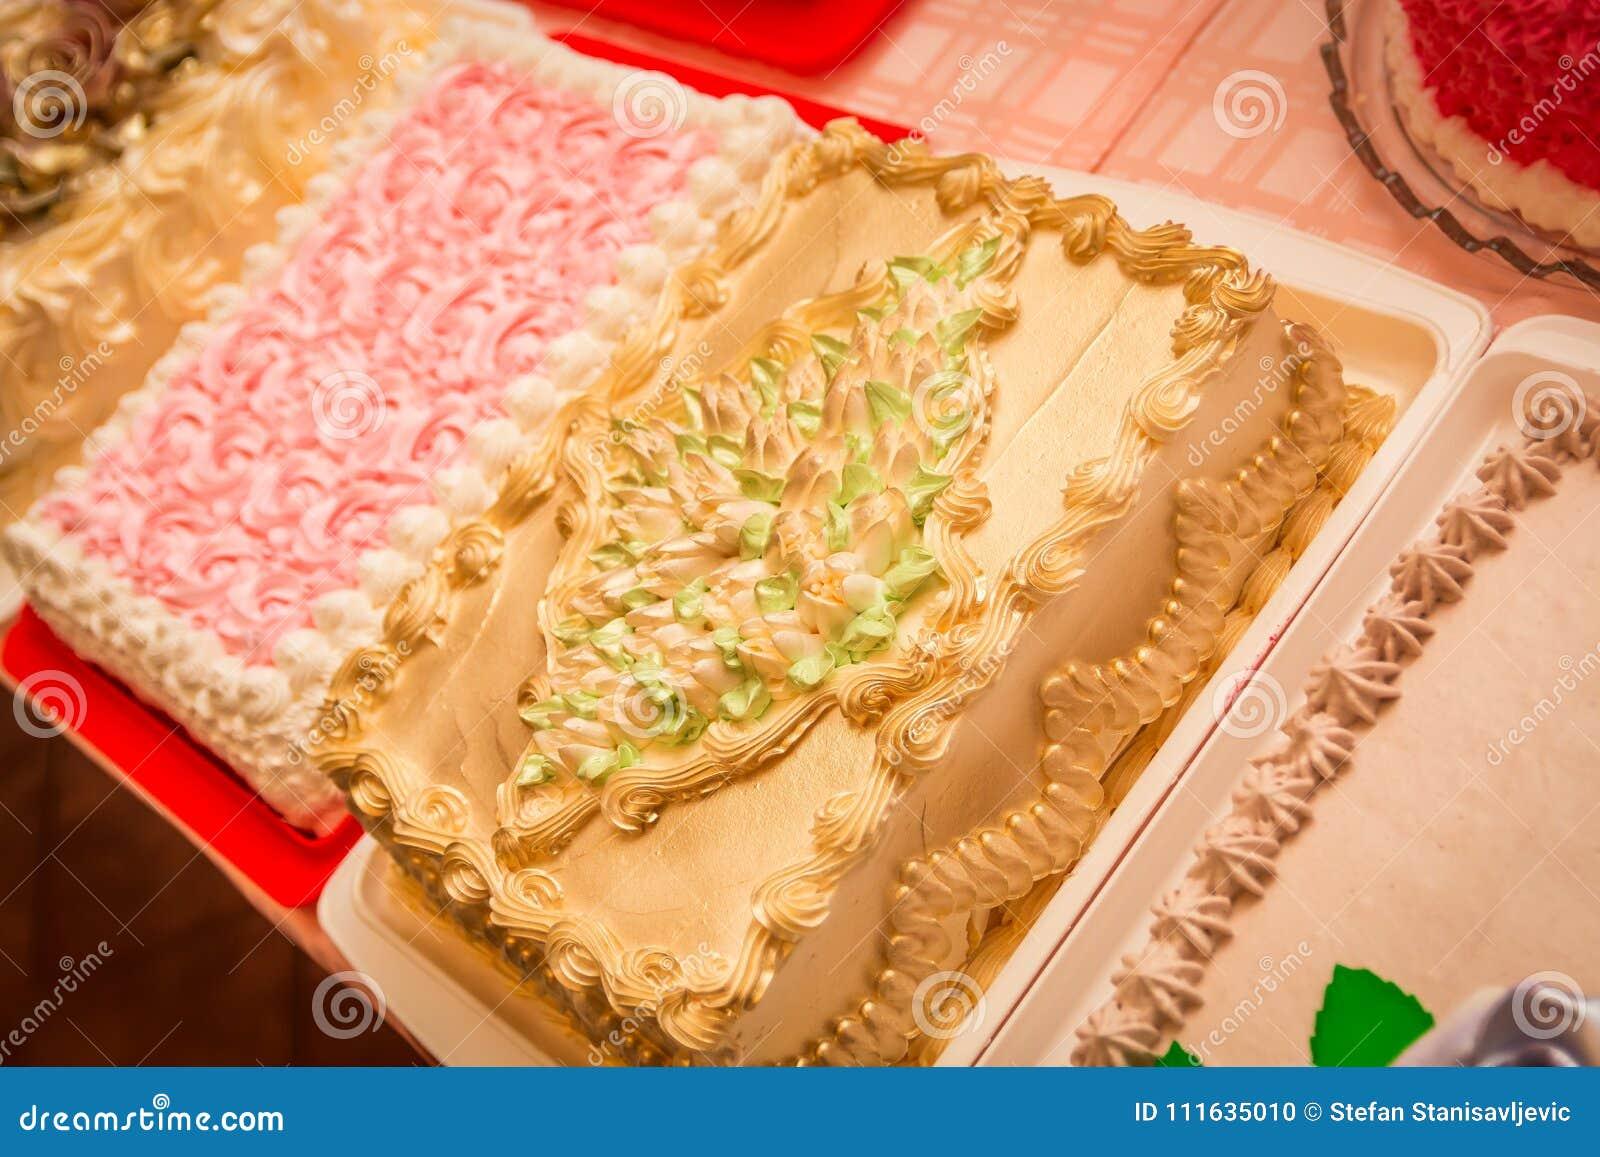 Homemade birthday cake stock photo. Image of cocoa, baked - 111635010